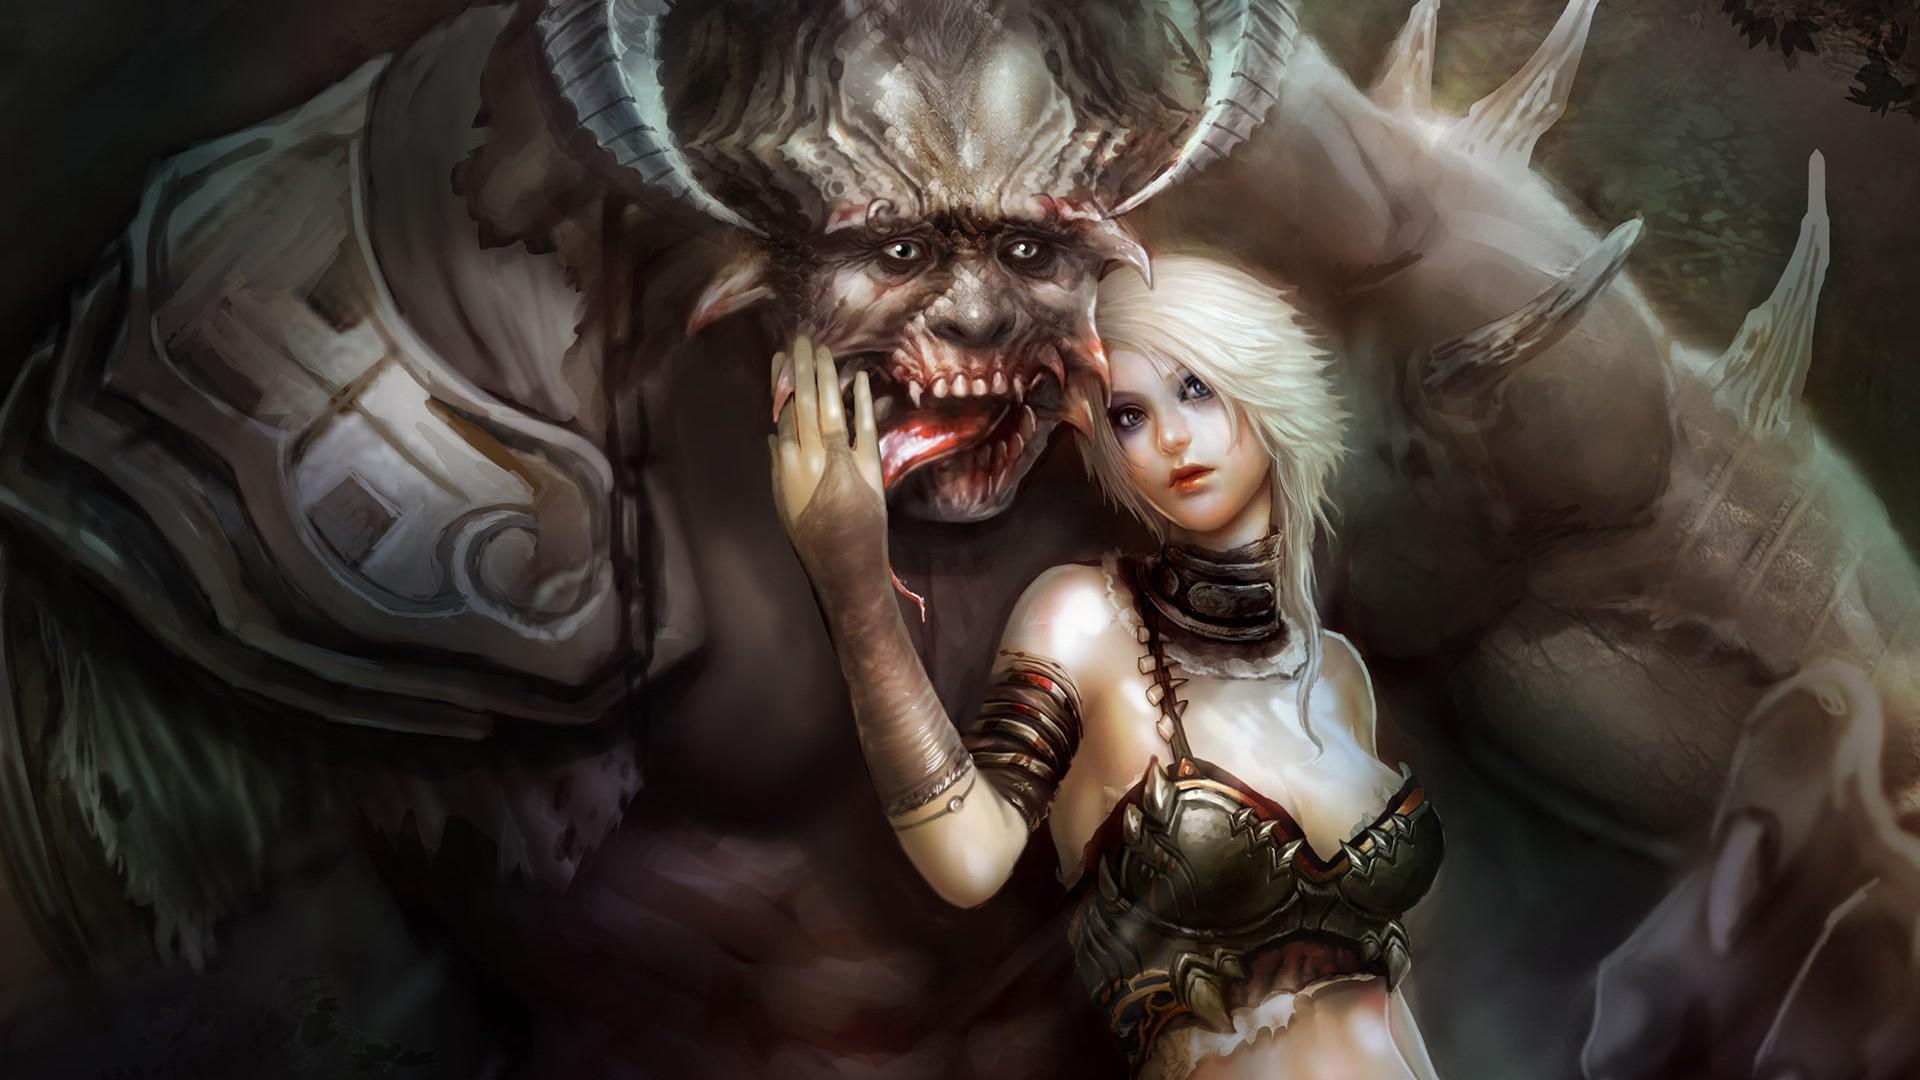 картинки девушка с монстром